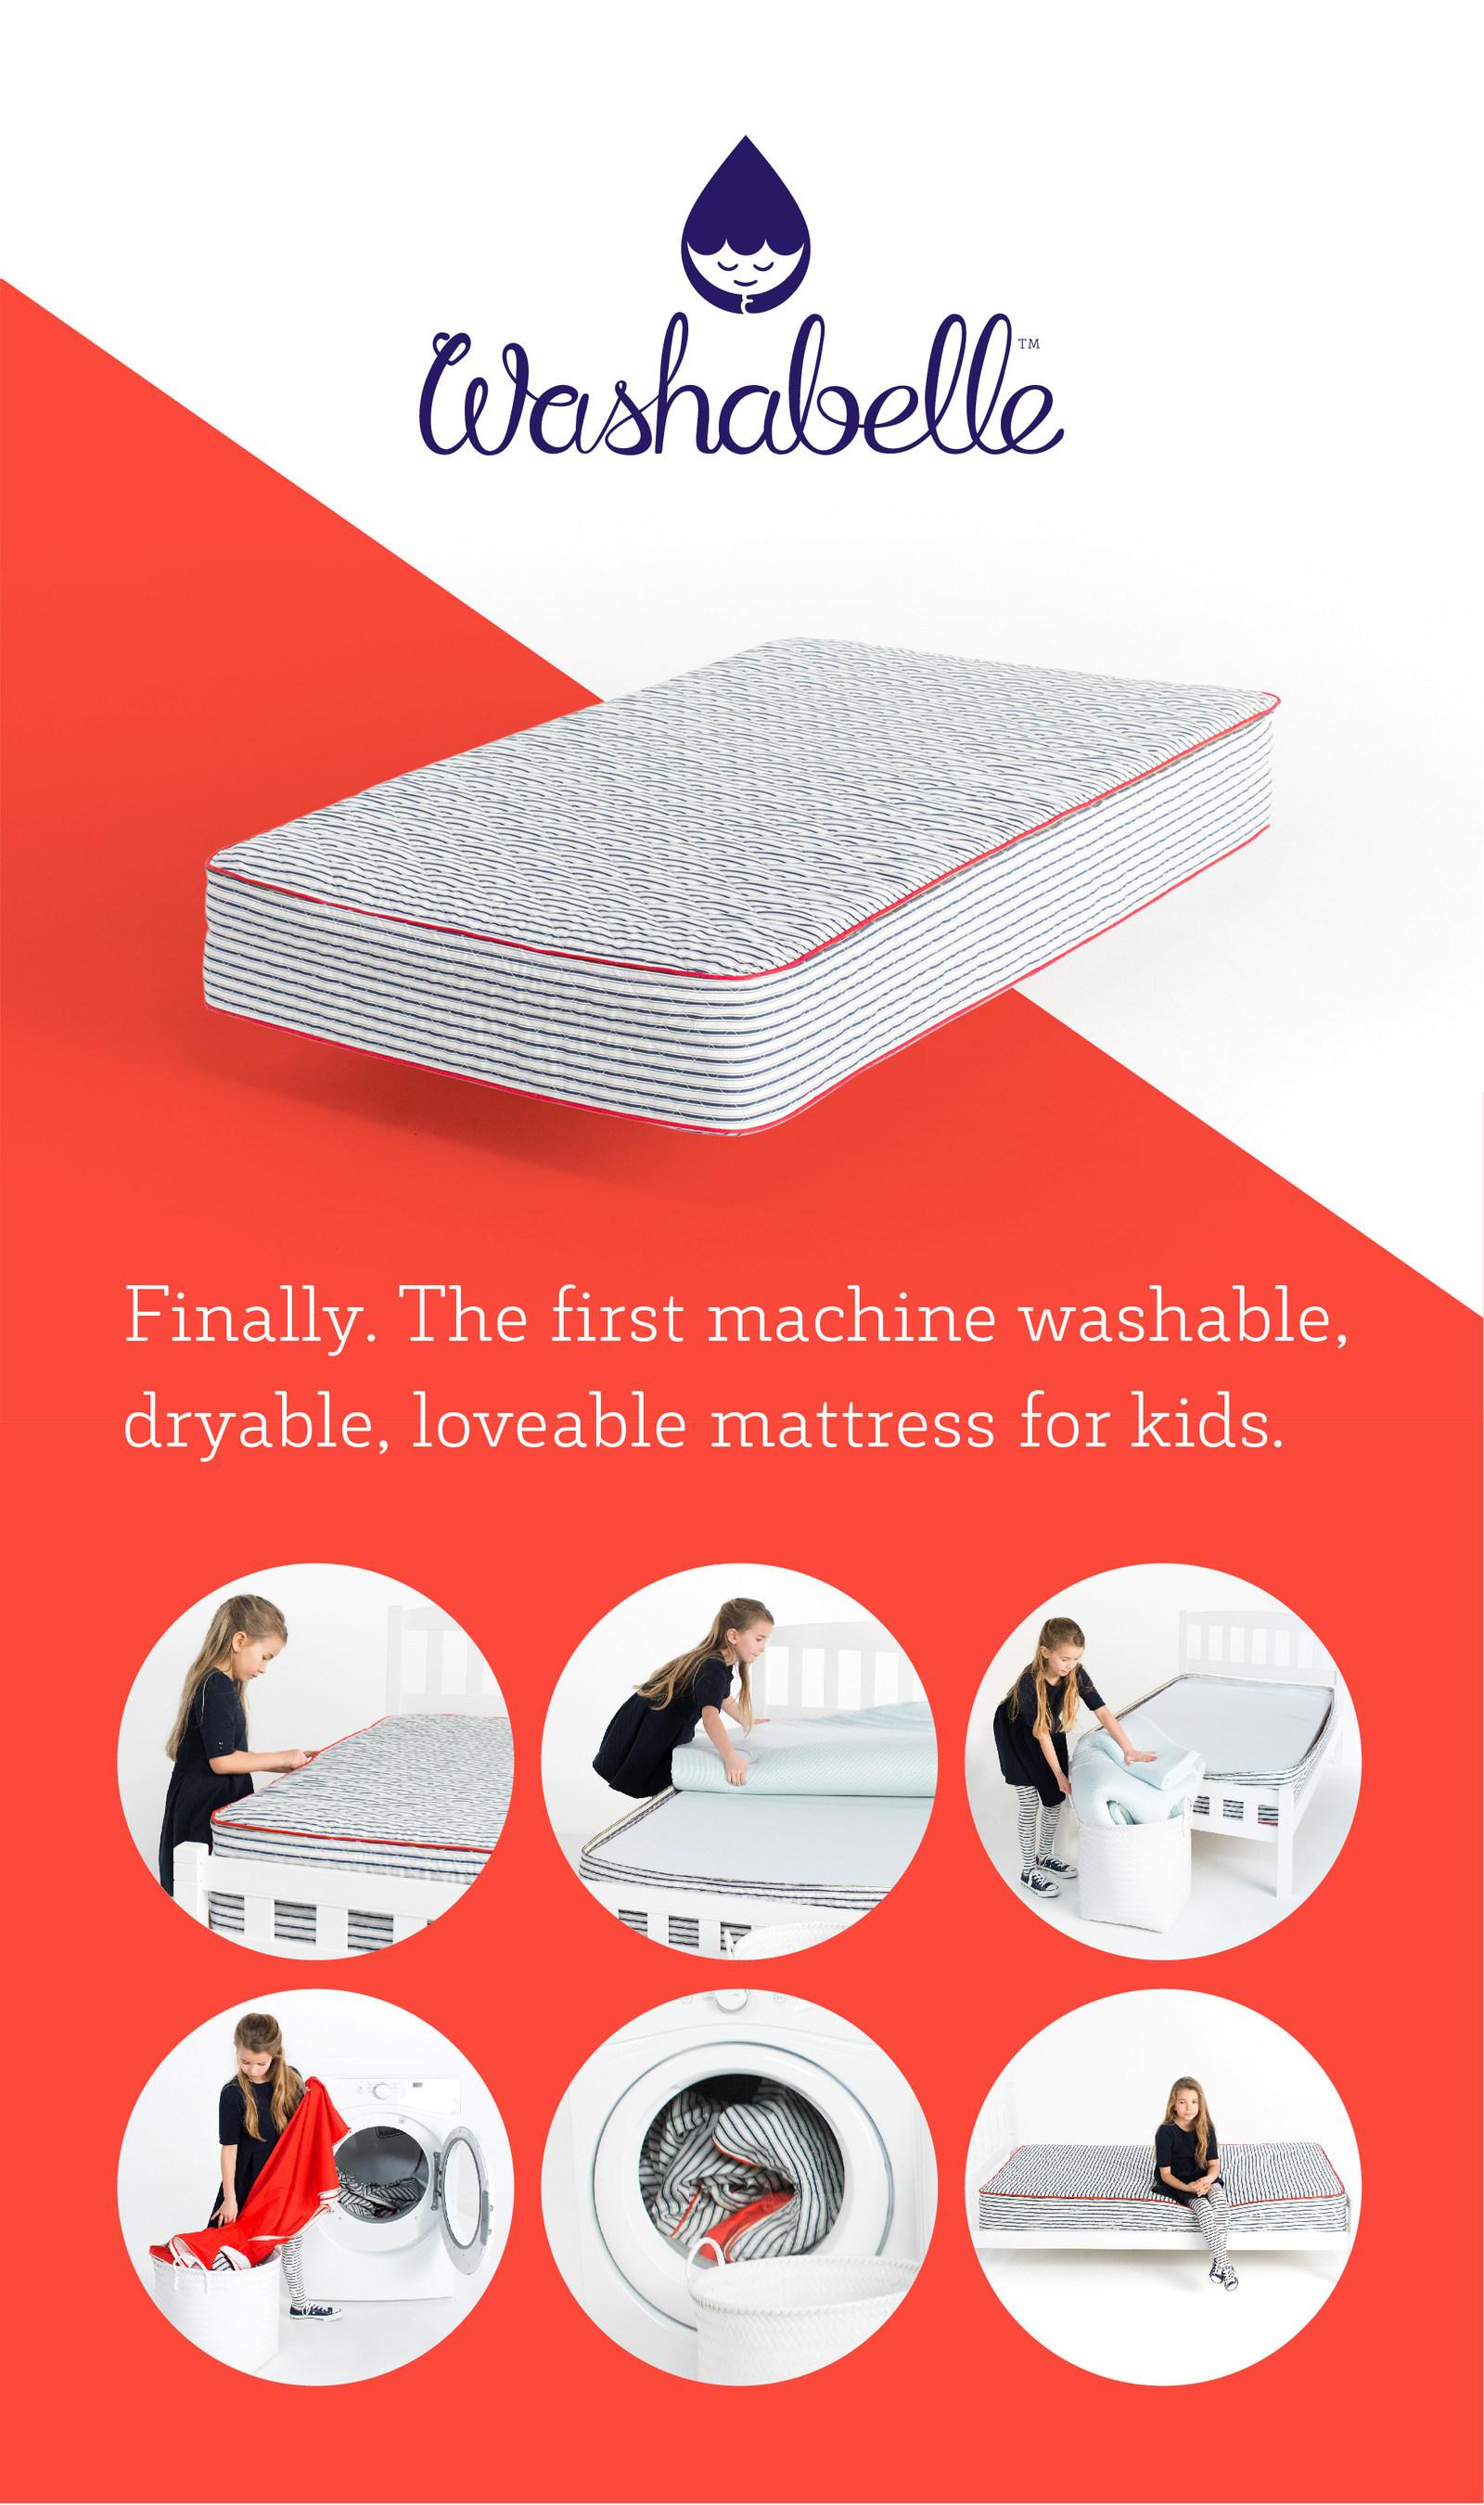 Mom invents machine washable mattress for kids